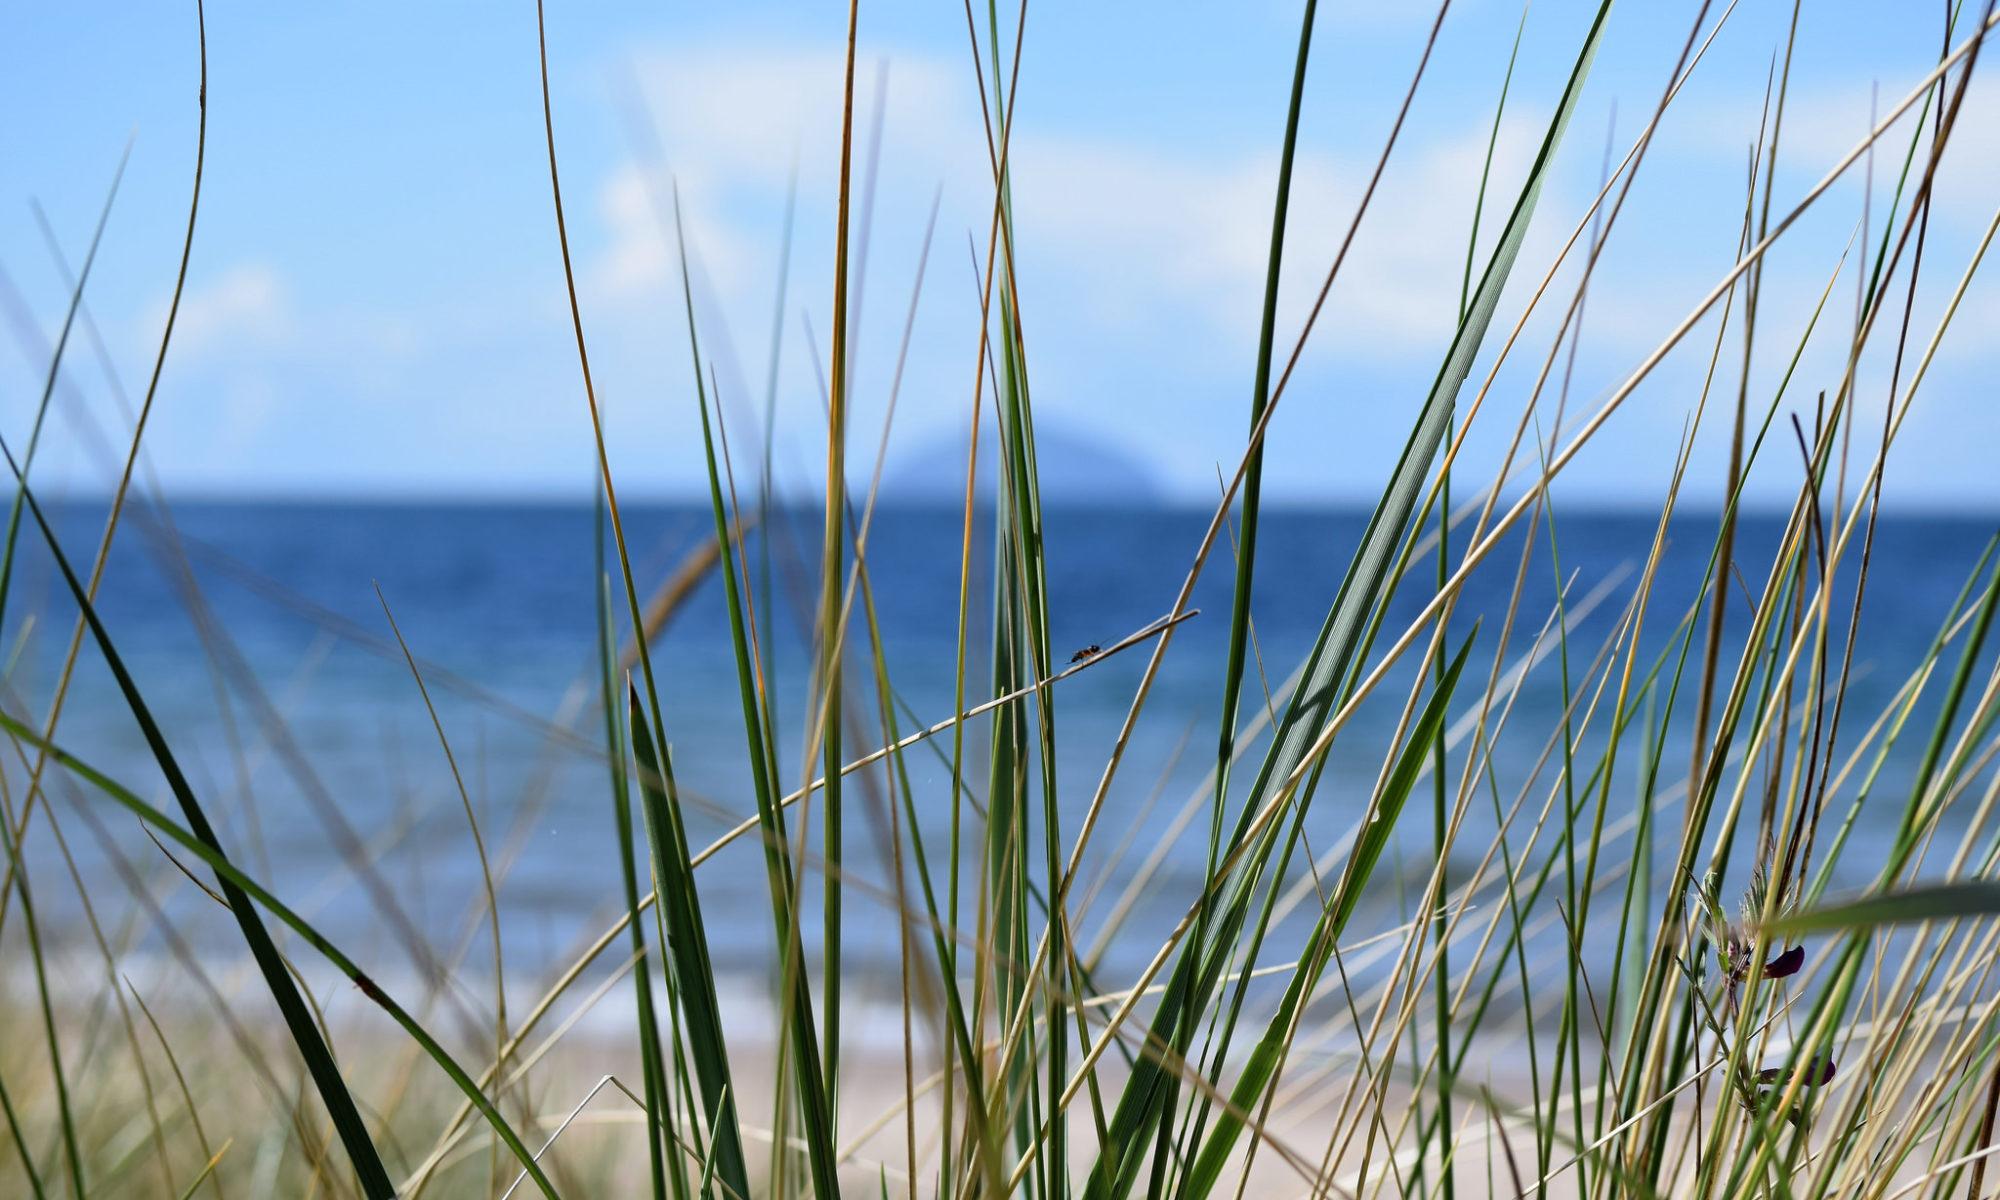 tall grass at beach